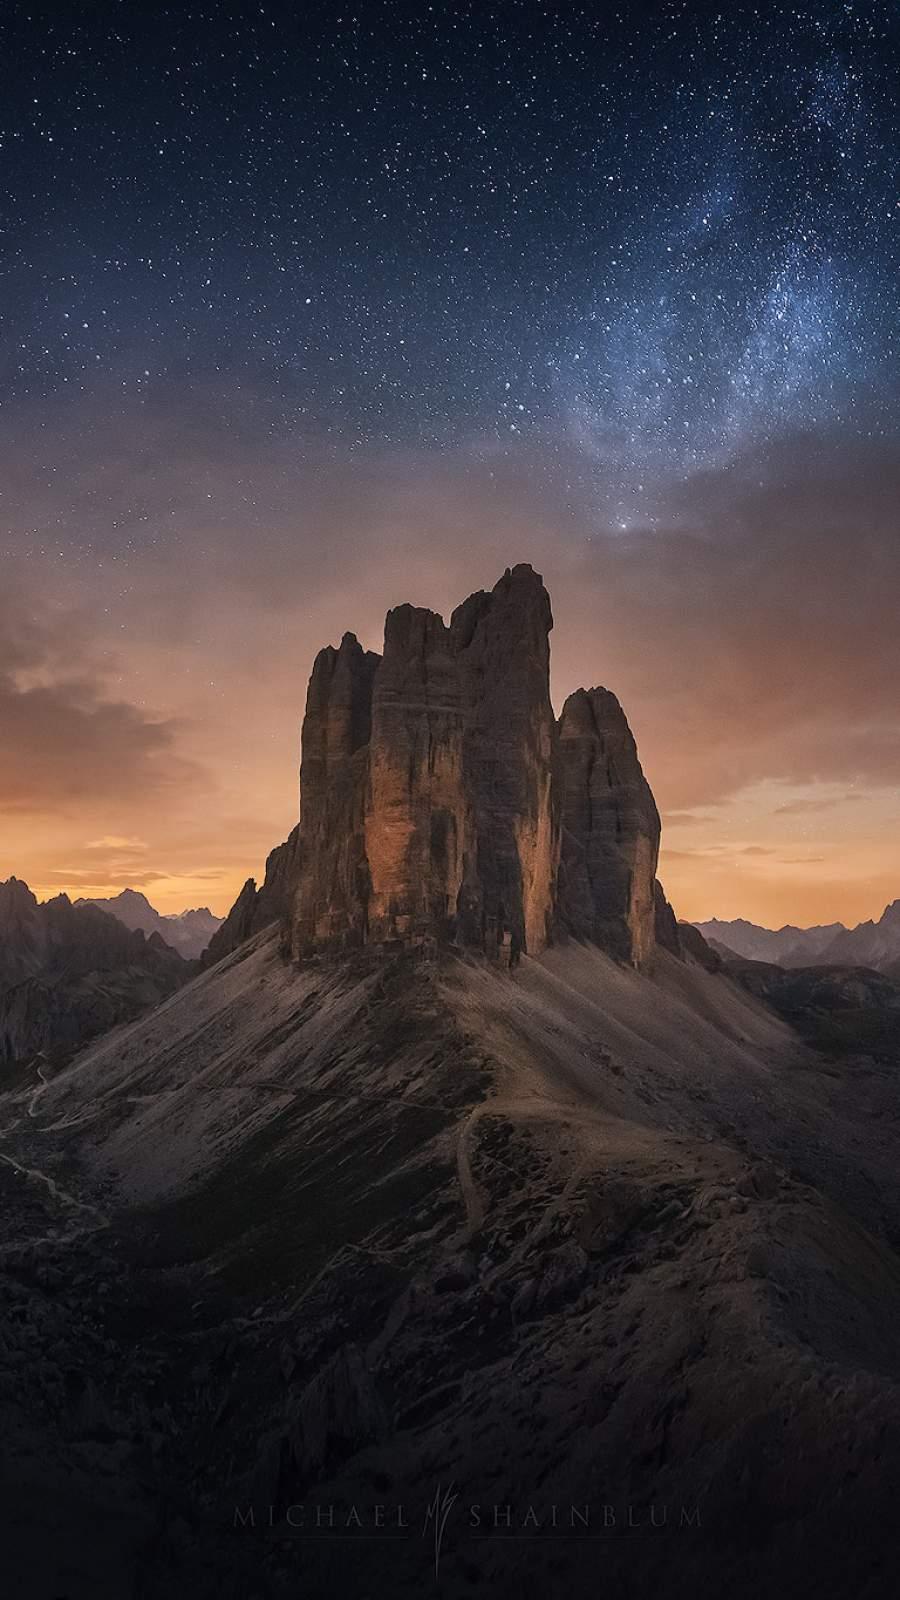 Big Rock Mountain Night Starry Sky iPhone Wallpaper